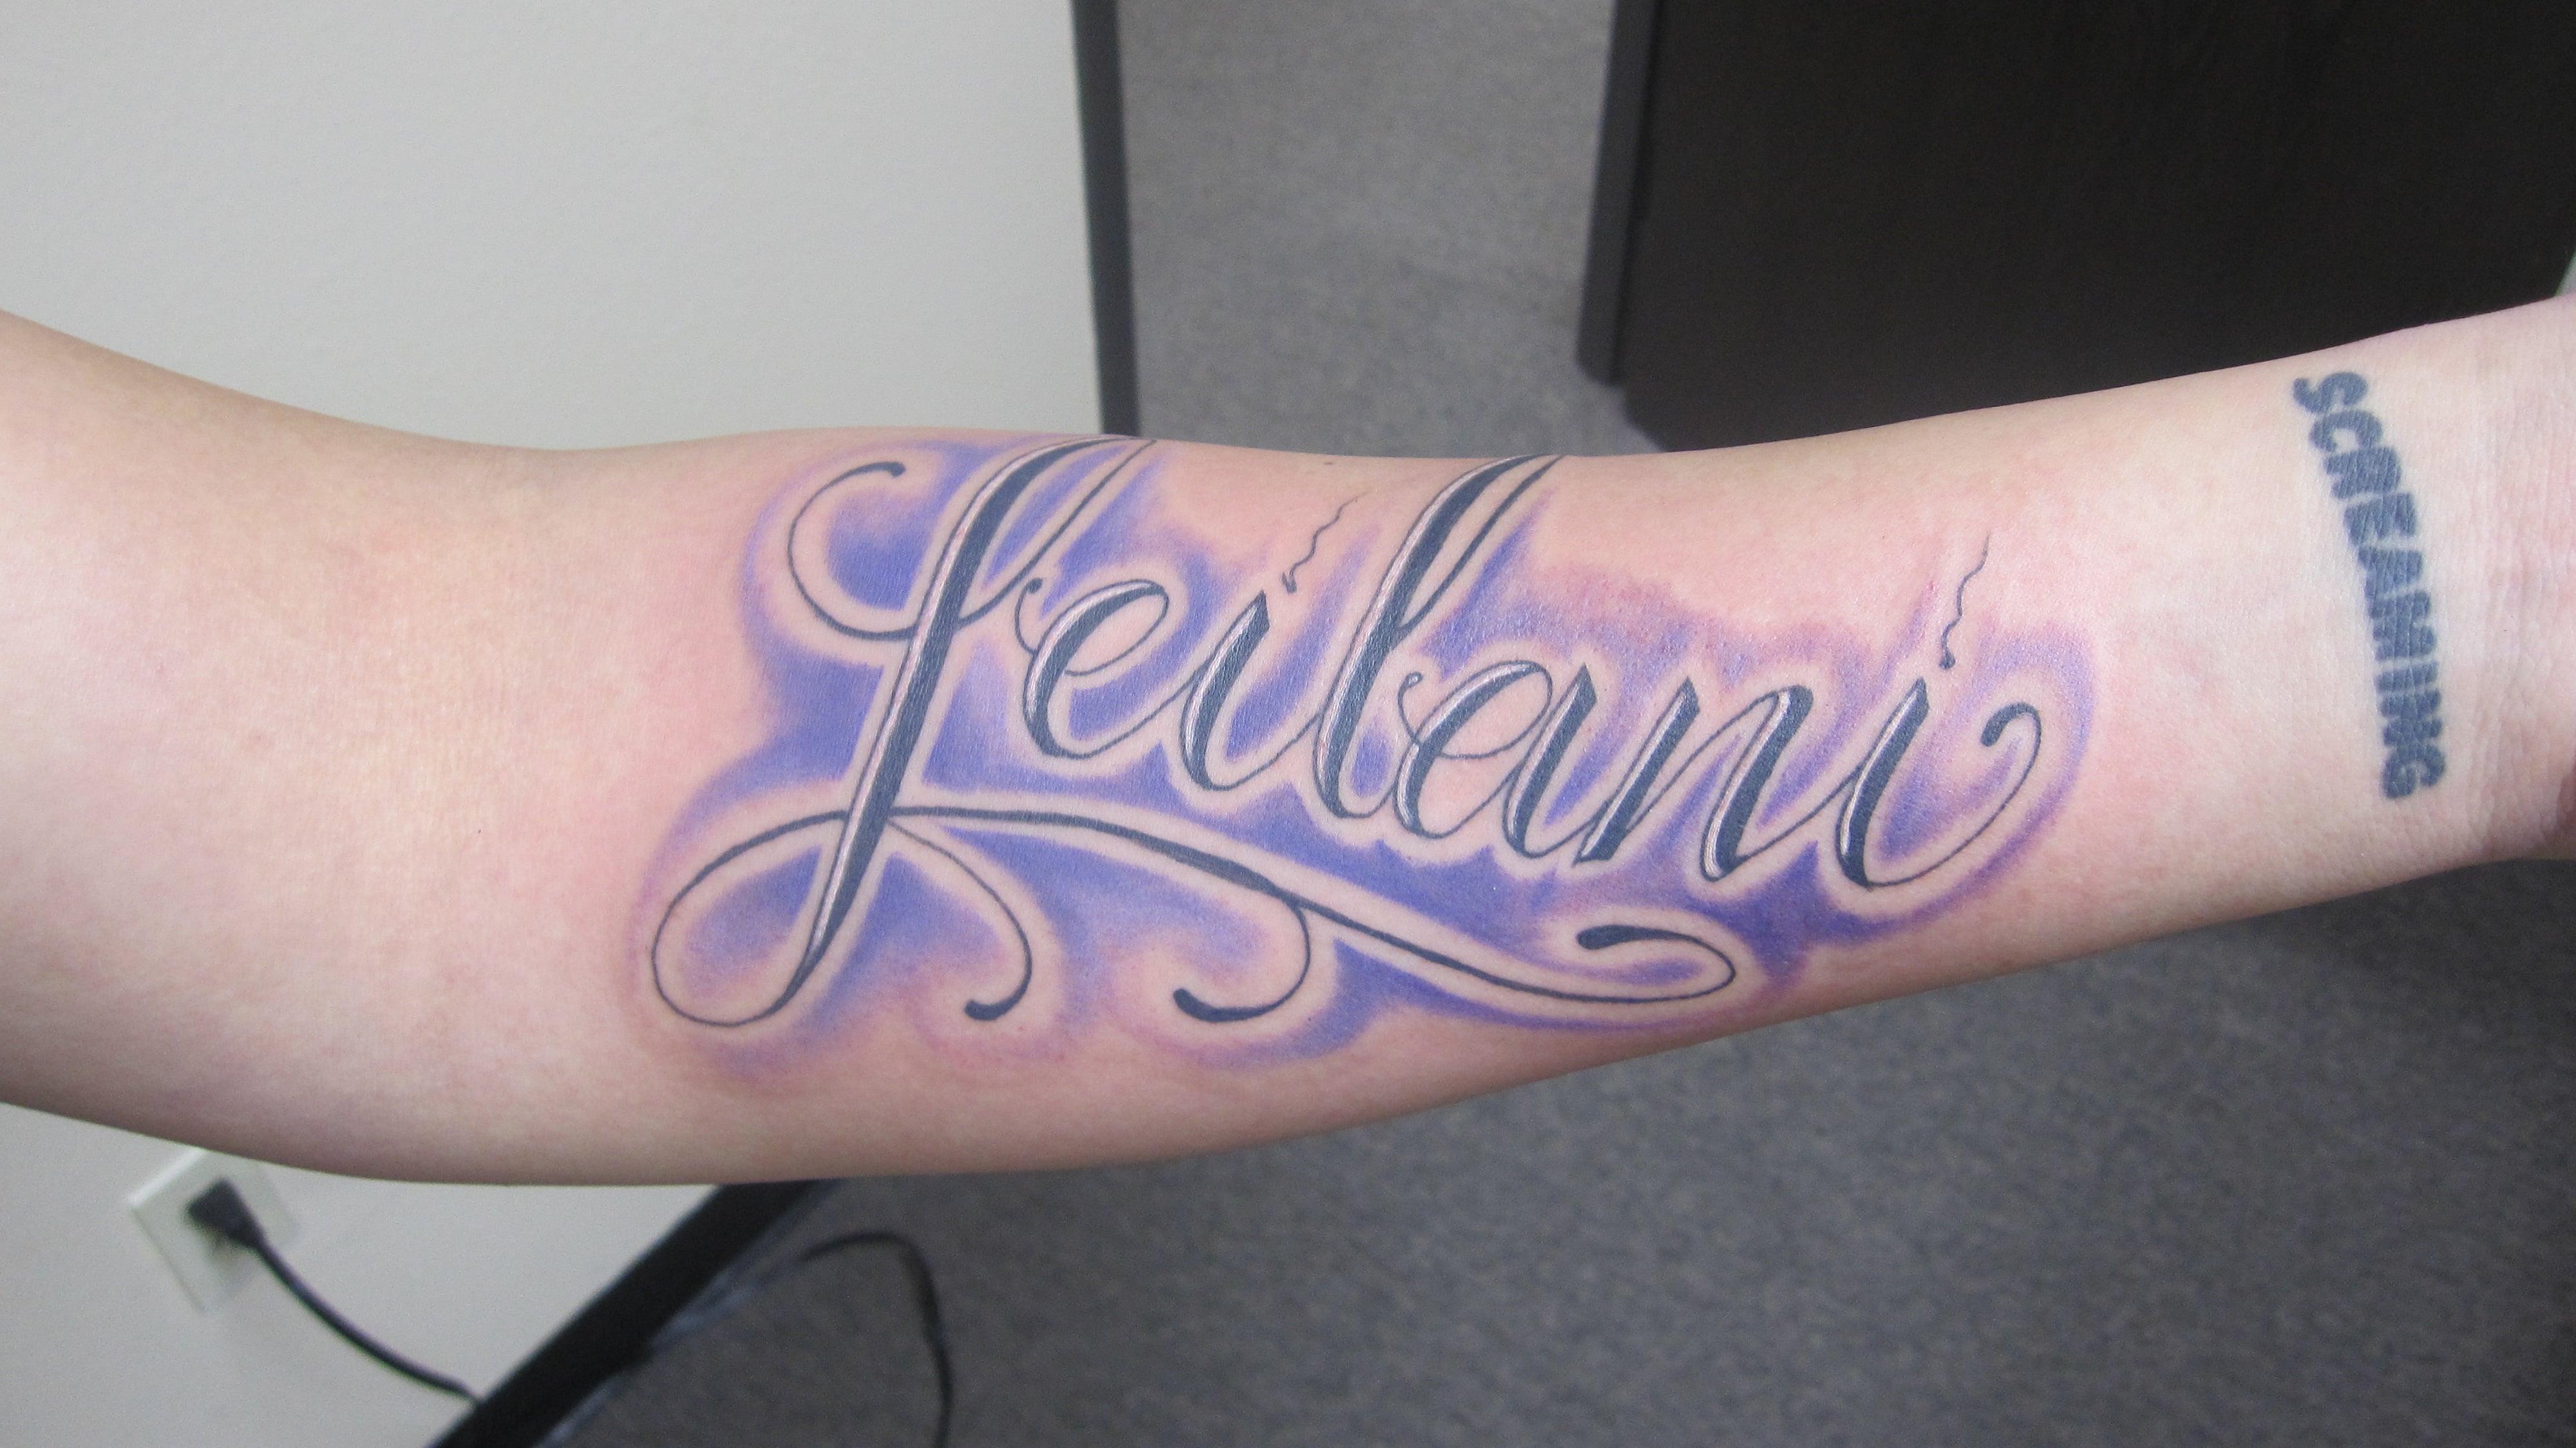 Tatuajes de nombres en el brazo ideas y fotograf as - Tattoo chiffre ...